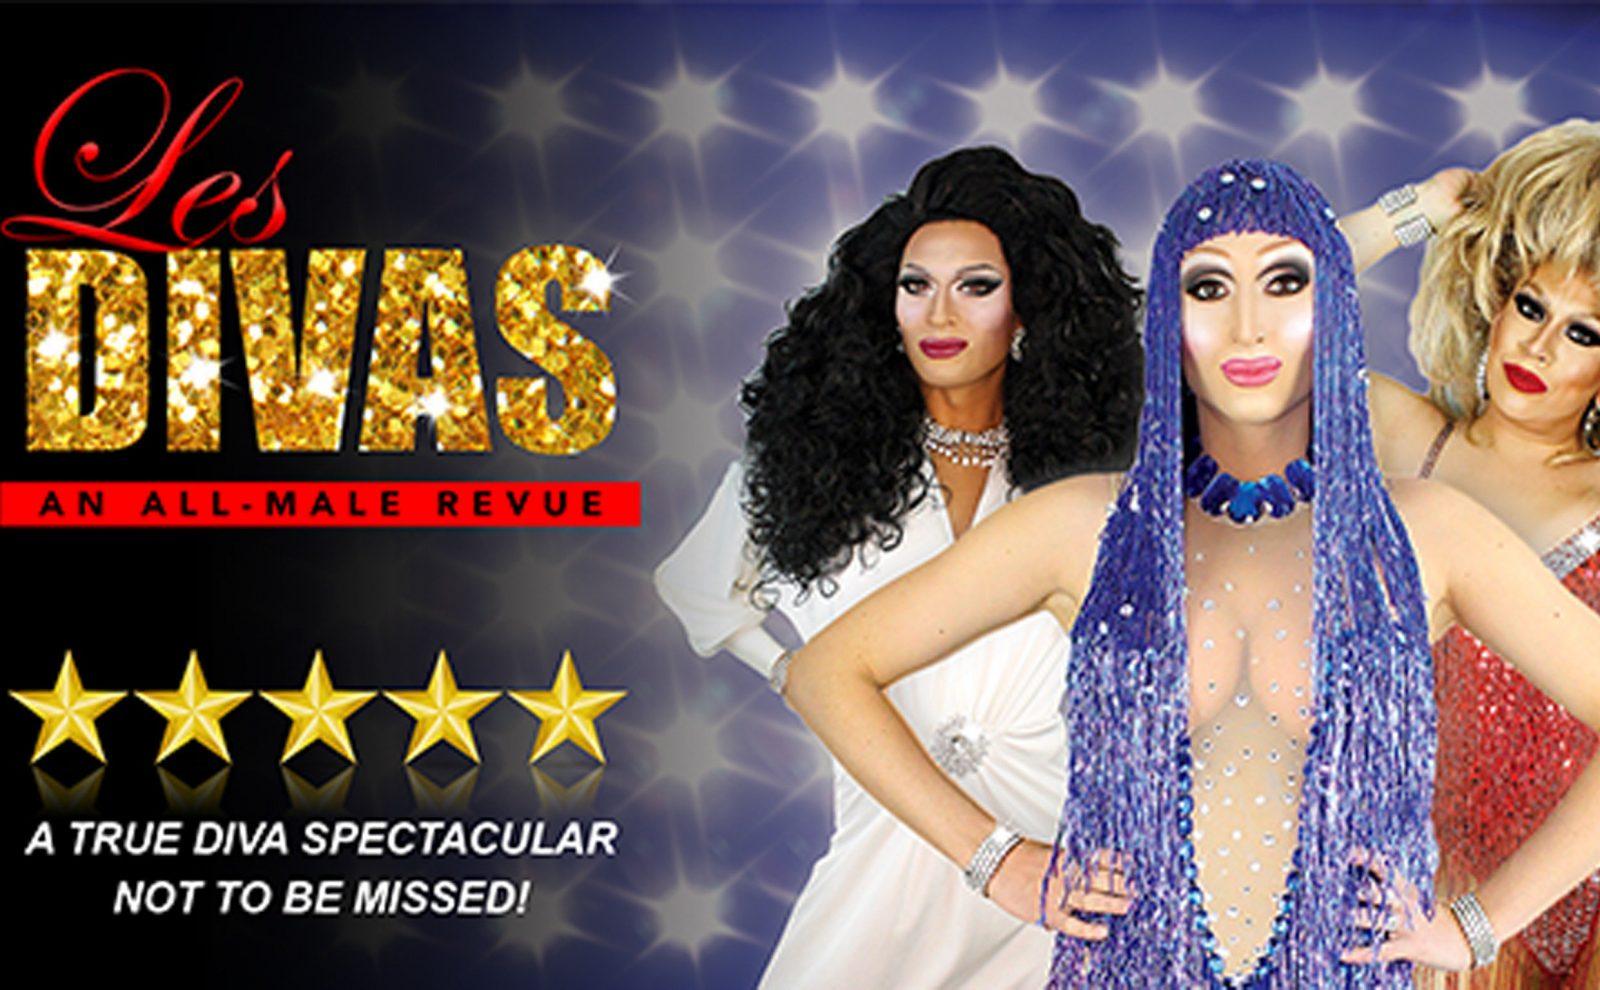 Stars of Les Divas